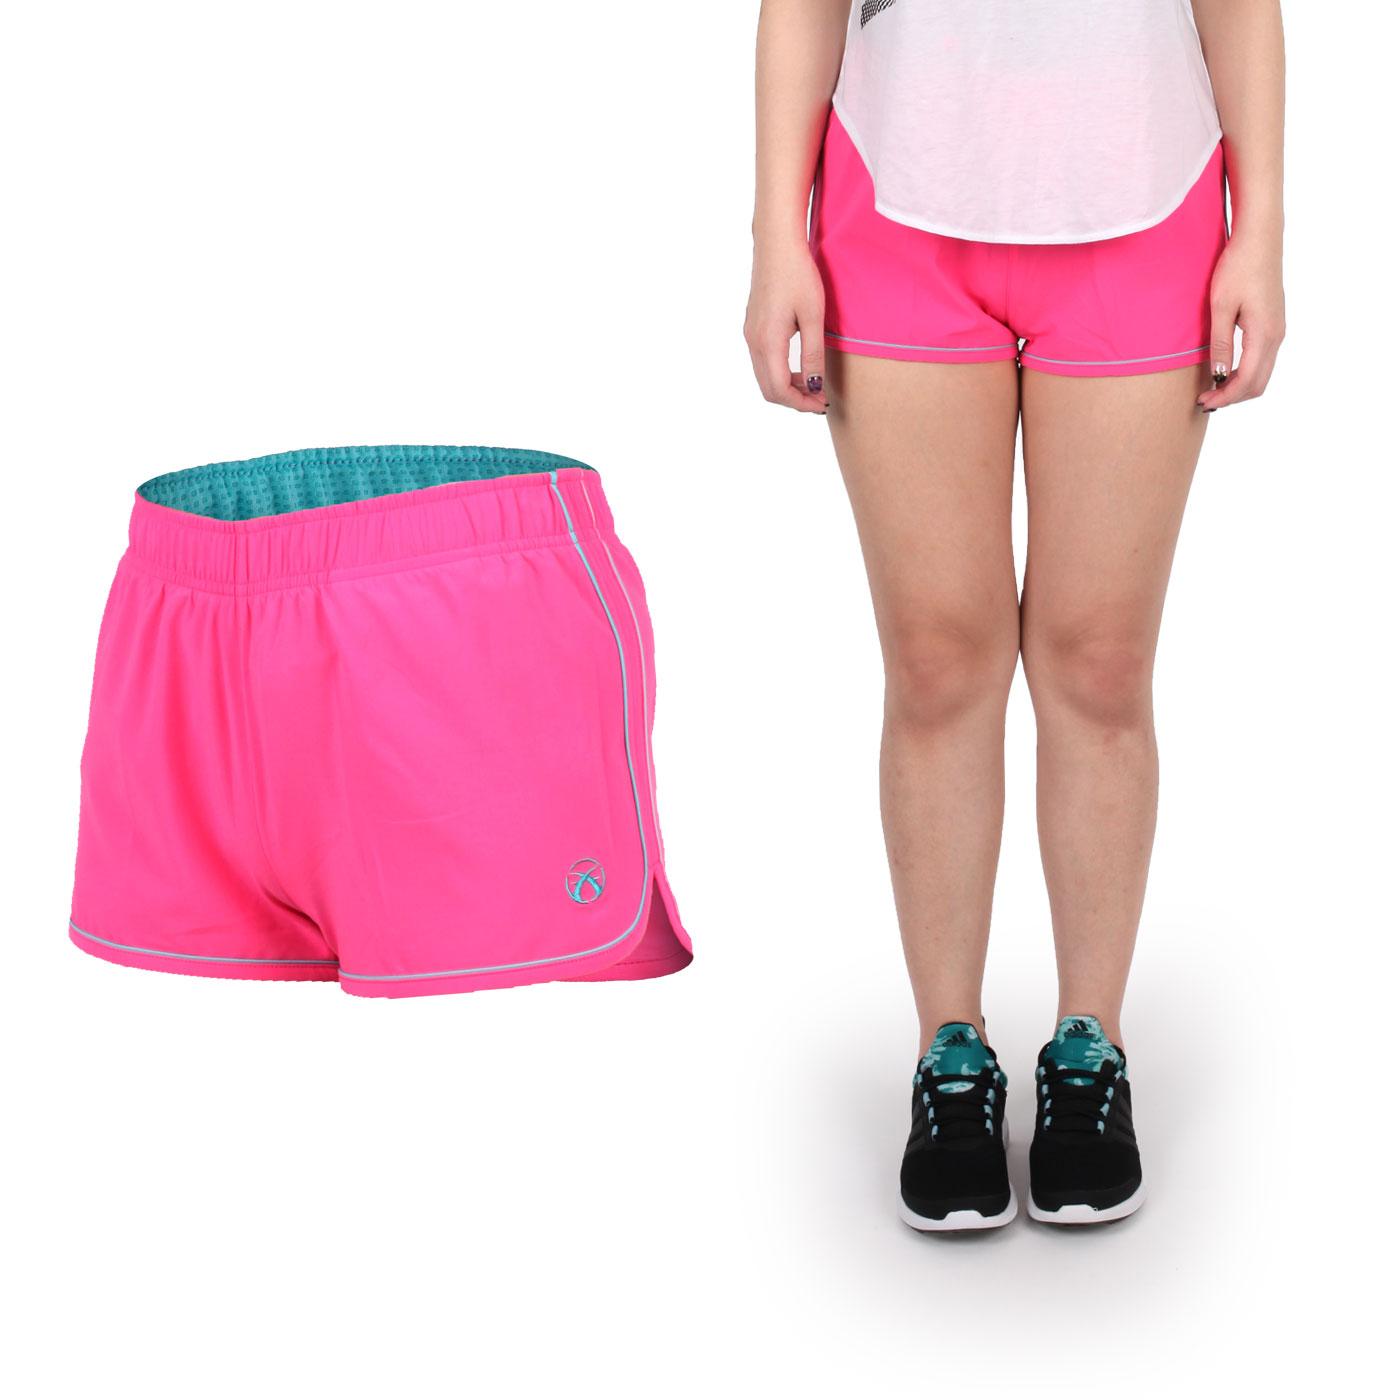 FIRESTAR 女款彈性平織慢跑短褲  CL625-10 - 粉紅湖水藍